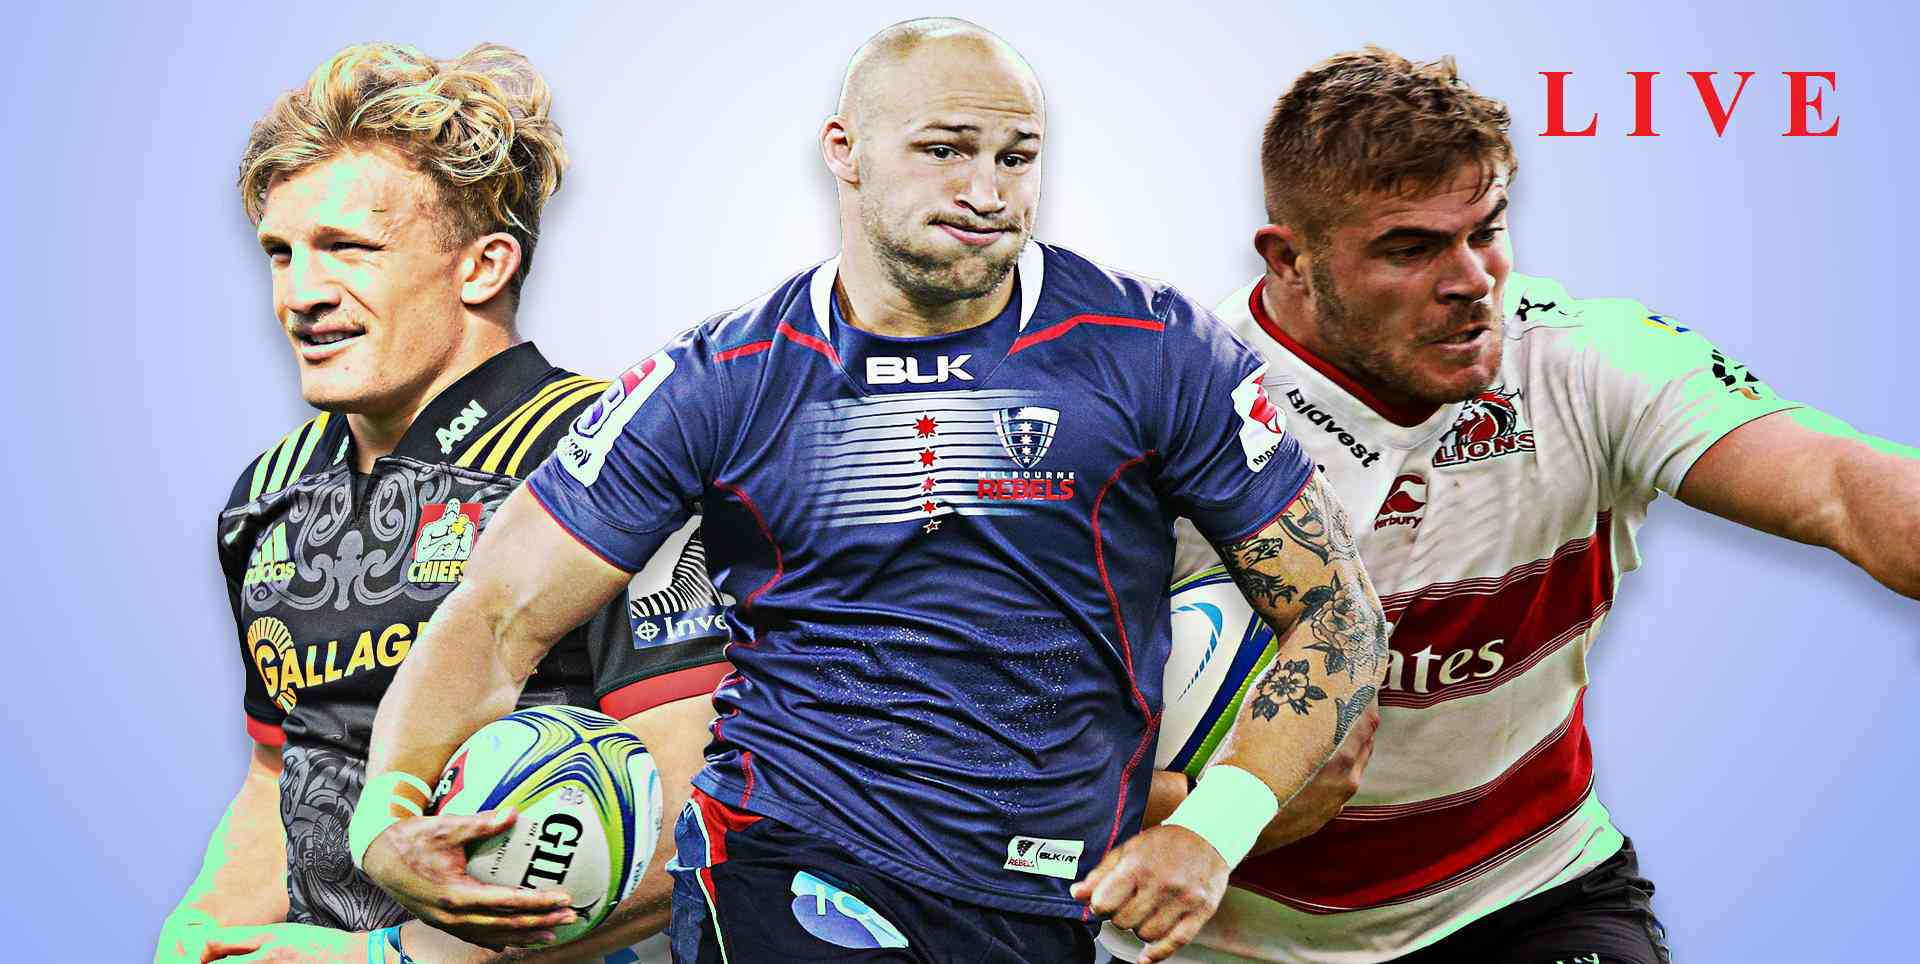 waratahs-vs-jaguares-2018-rugby-live-stream